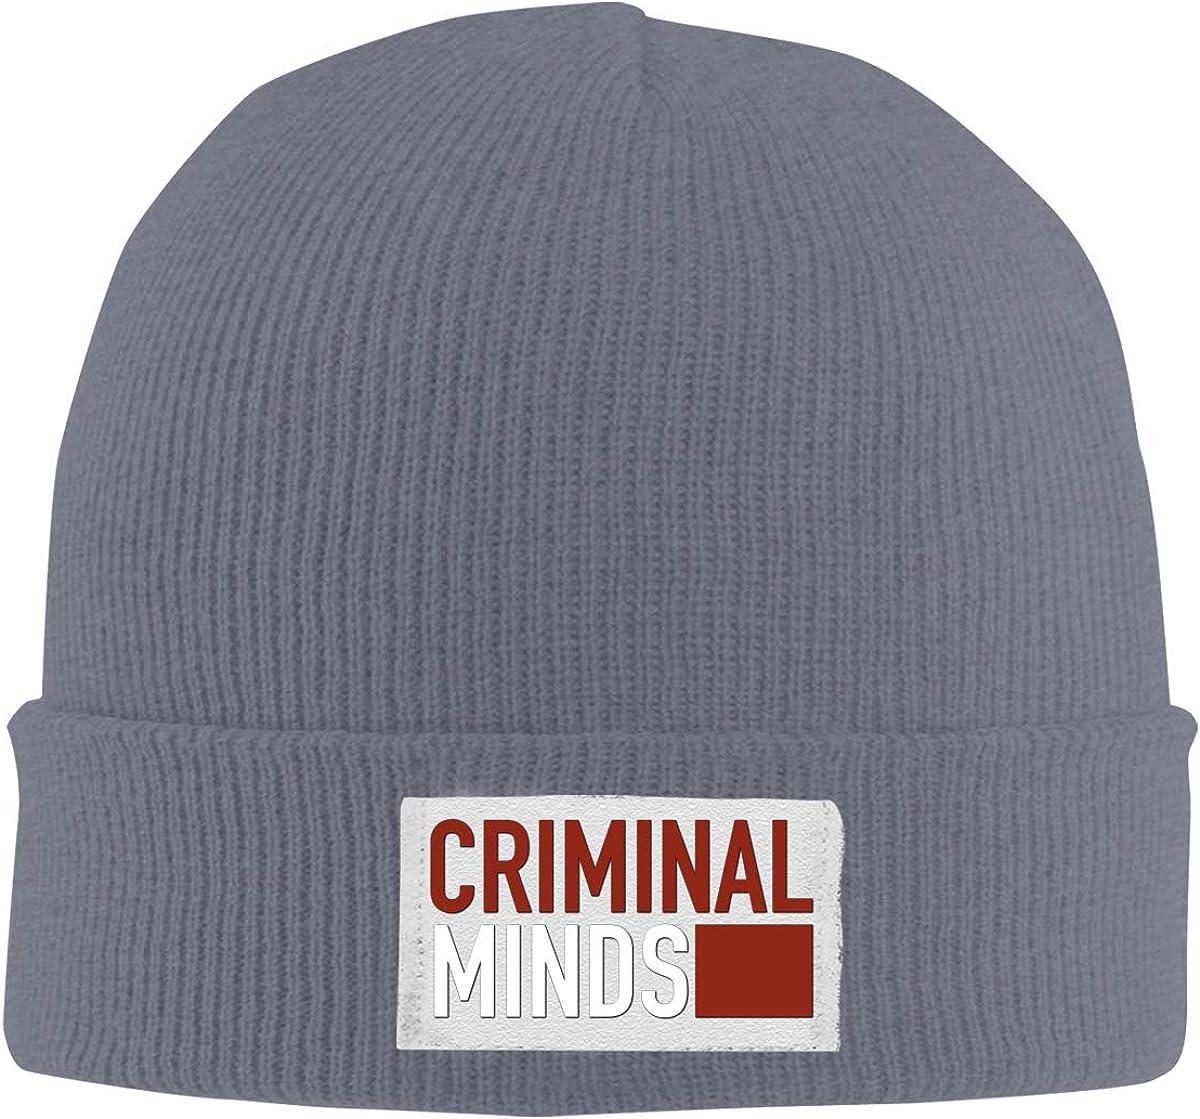 Dunpaiaa Skull Caps Criminal Minds Winter Warm Knit Hats Stretchy Cuff Beanie Hat Black